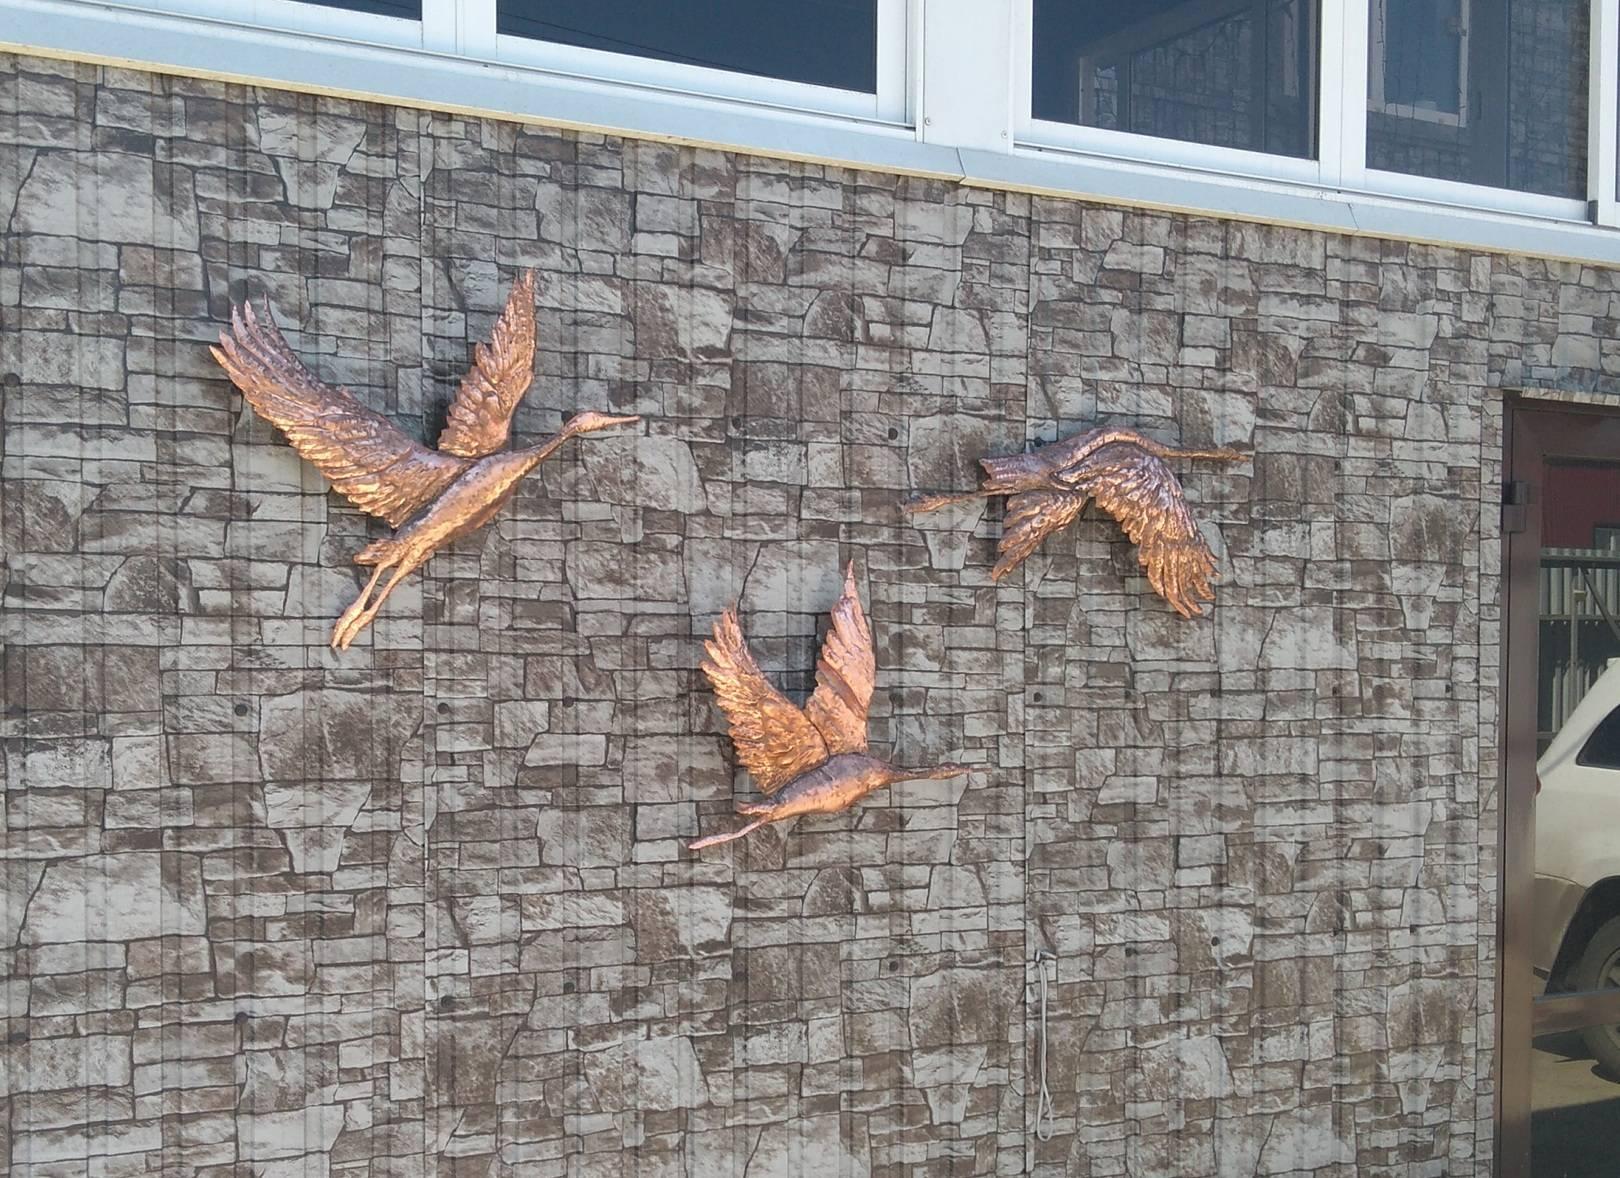 "Триптих. "" ..а утки летят"" из серии ""Медные петроглифы"". Иркутске 2020.Медь. Металлопластика.Чеканка.Торевтика."